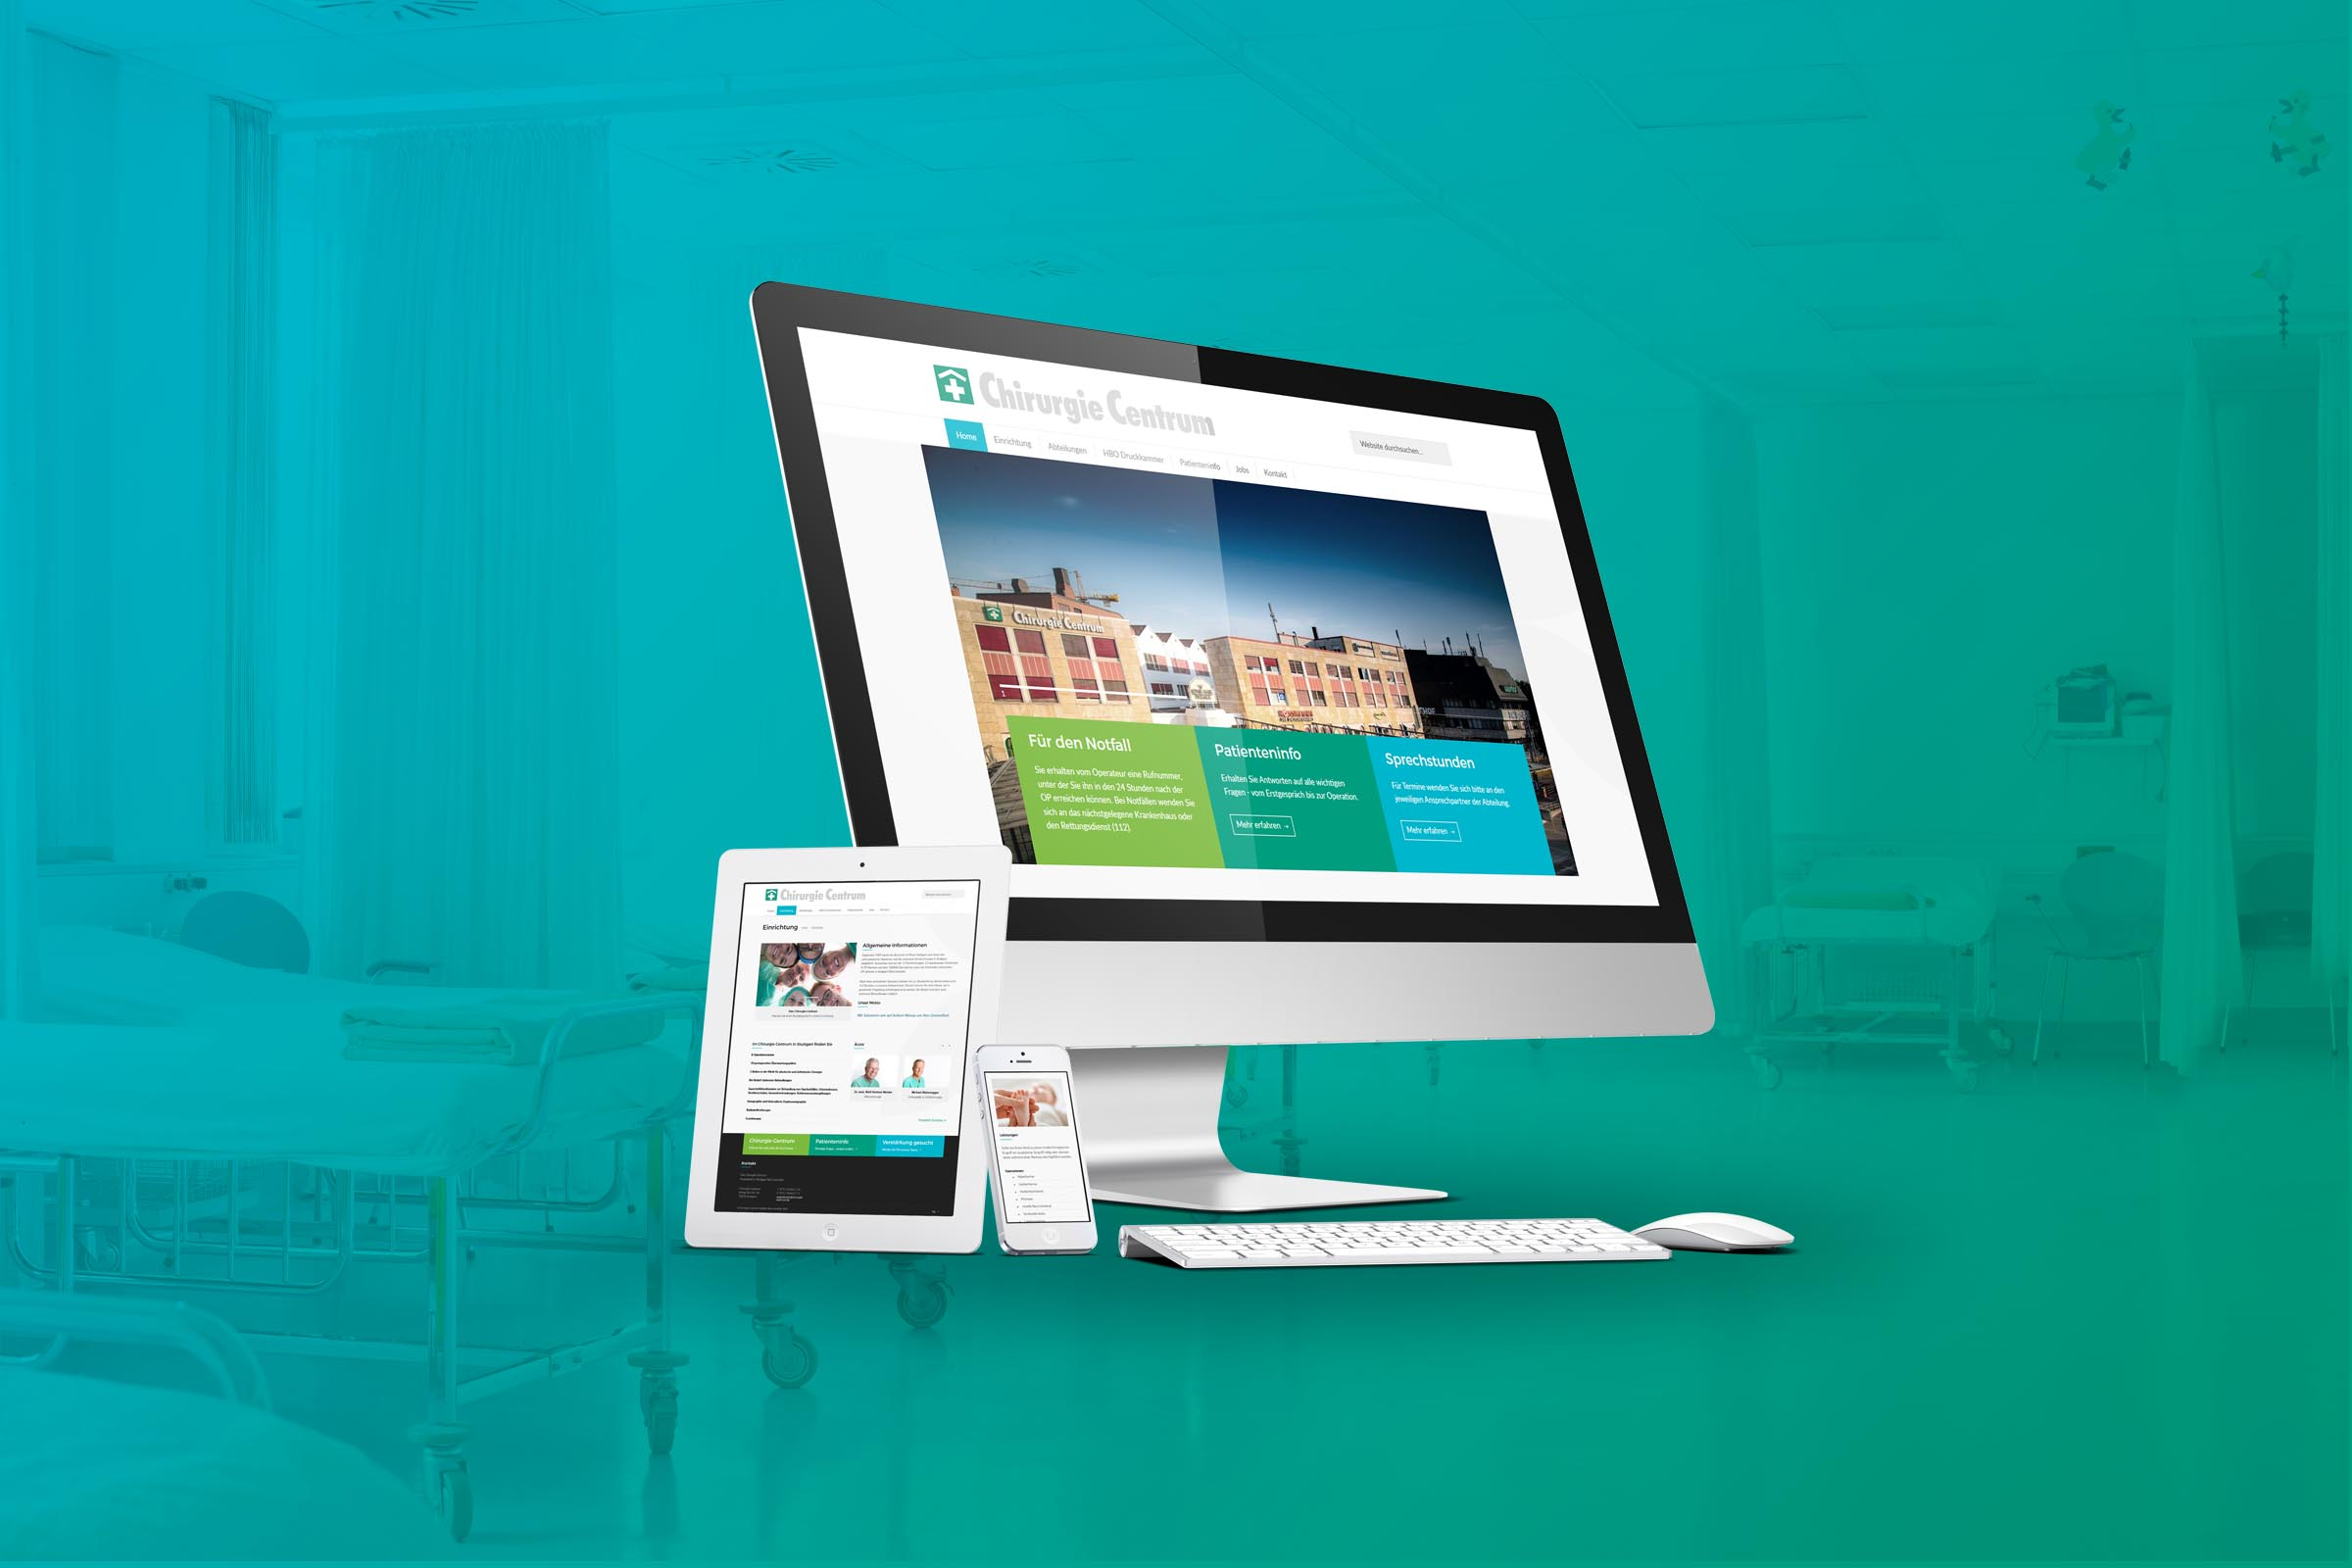 Chirurgie Centrum | Web